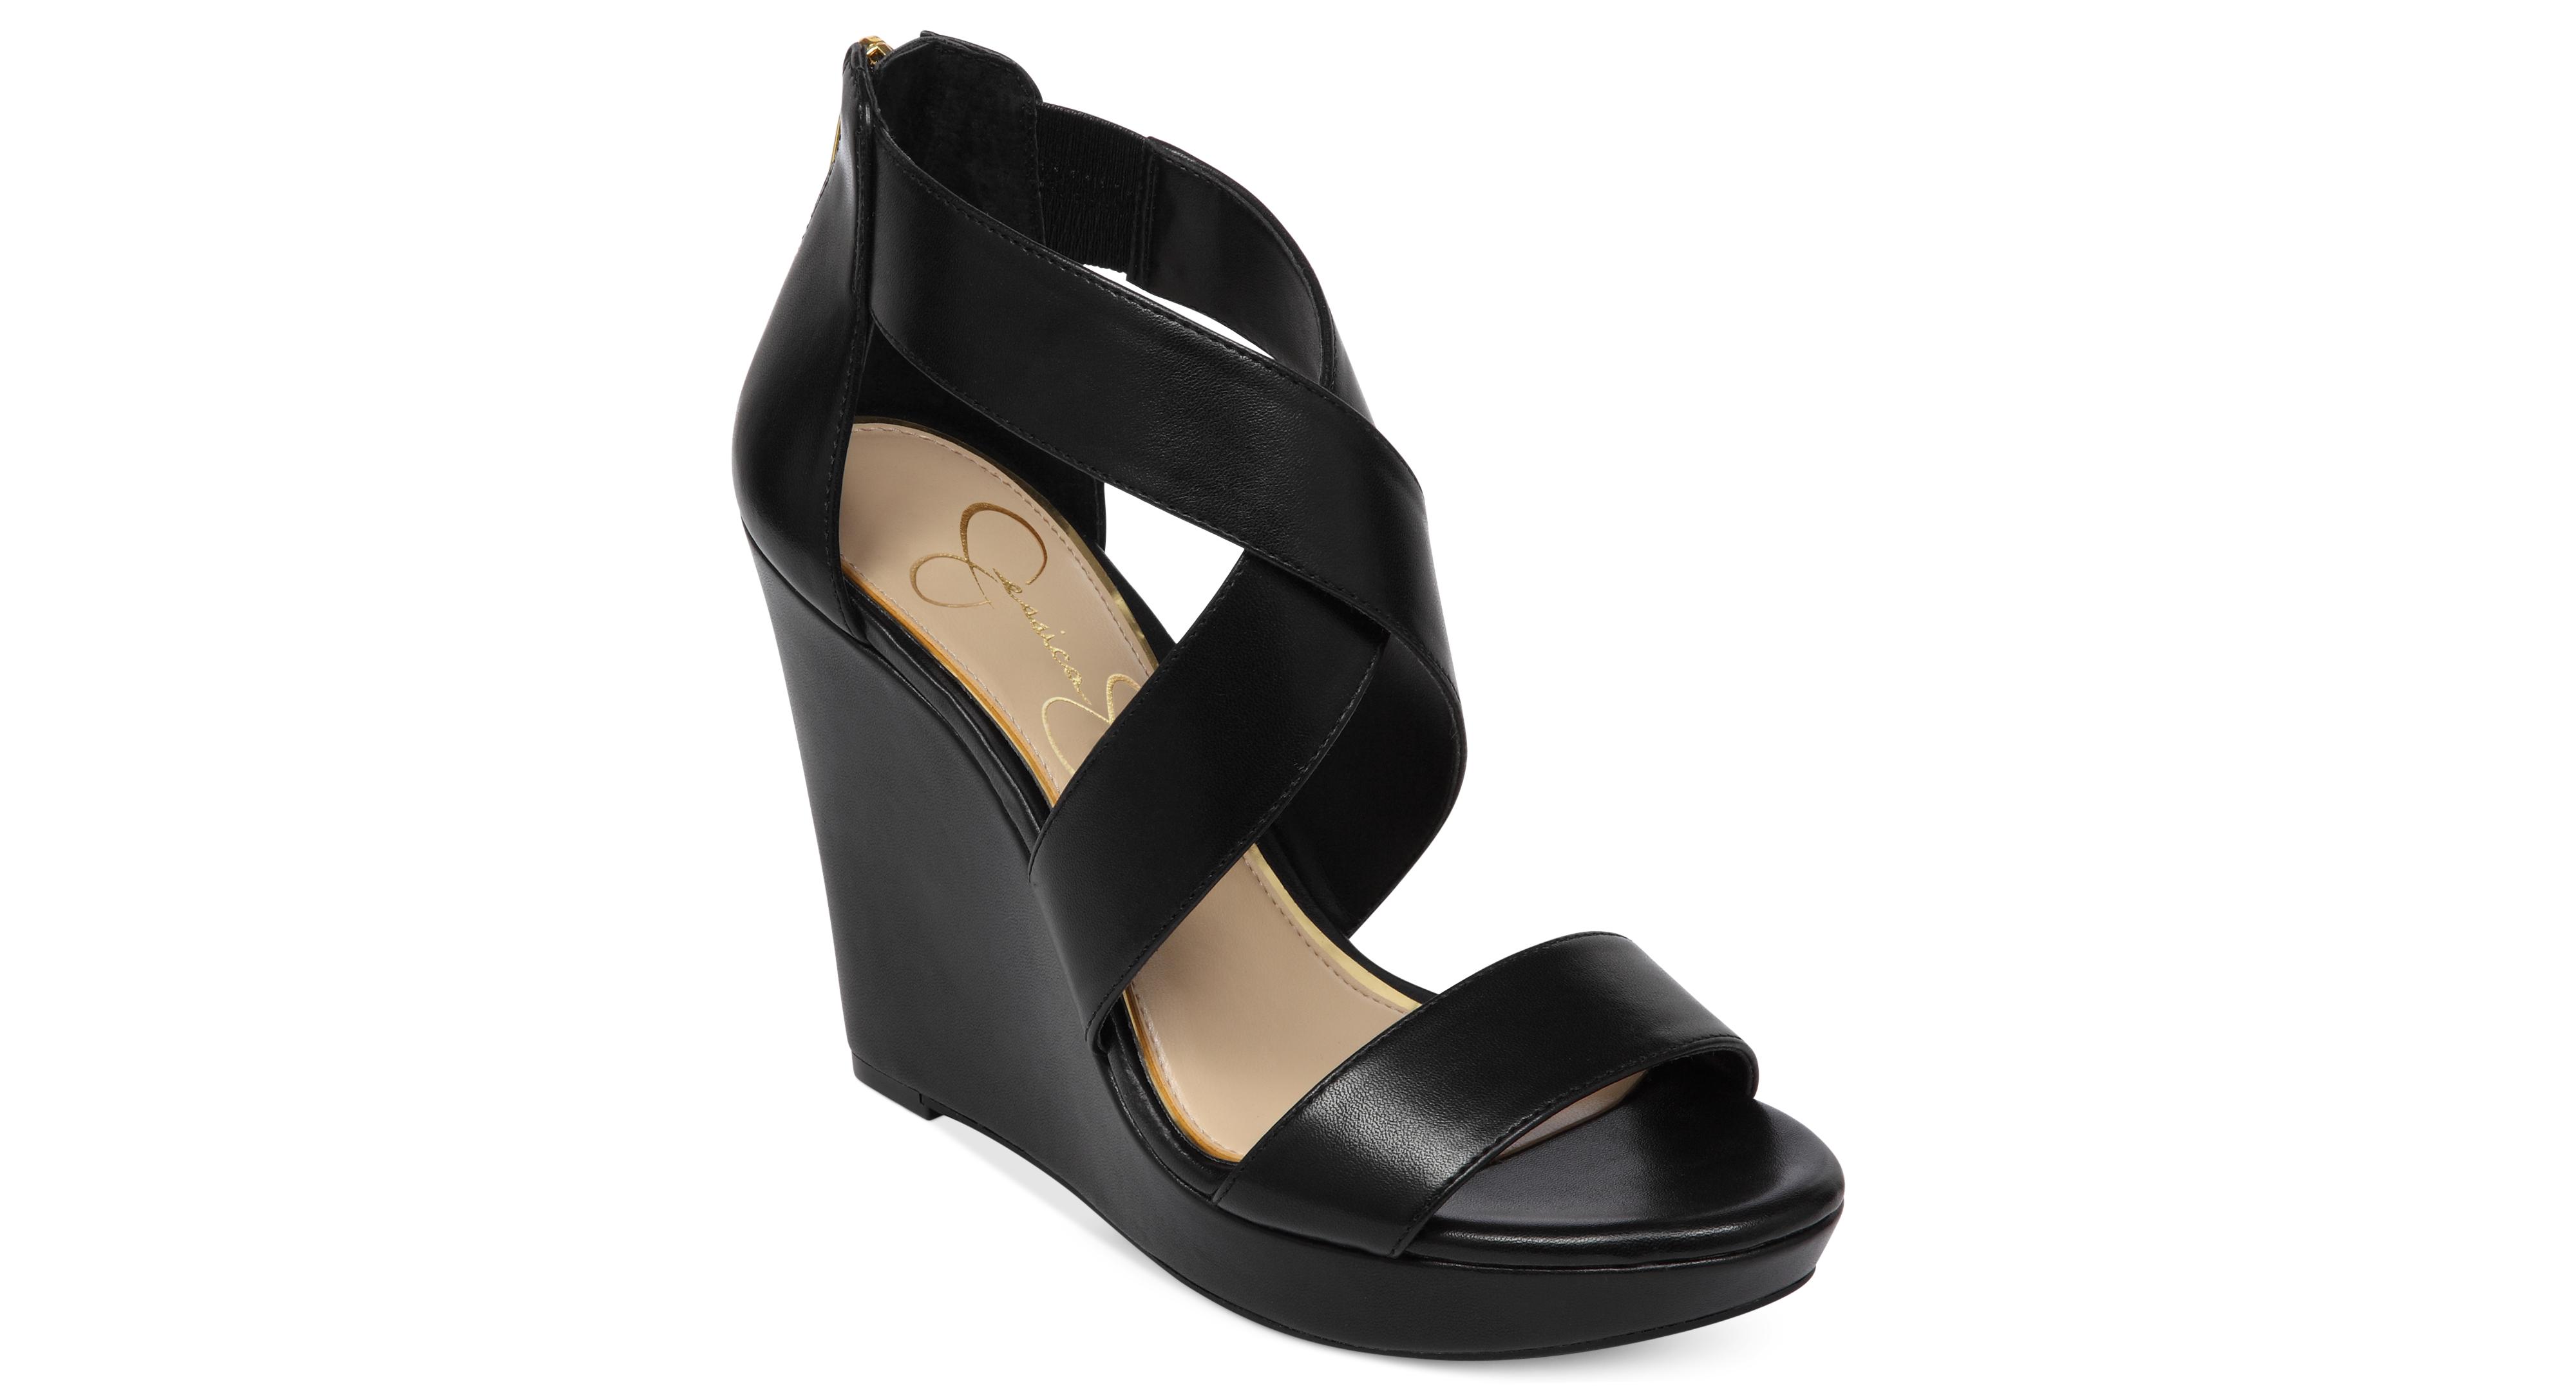 6bedf52b48acc Jessica Simpson Jinxxi Platform Wedge Sandals | Products | Shoes ...